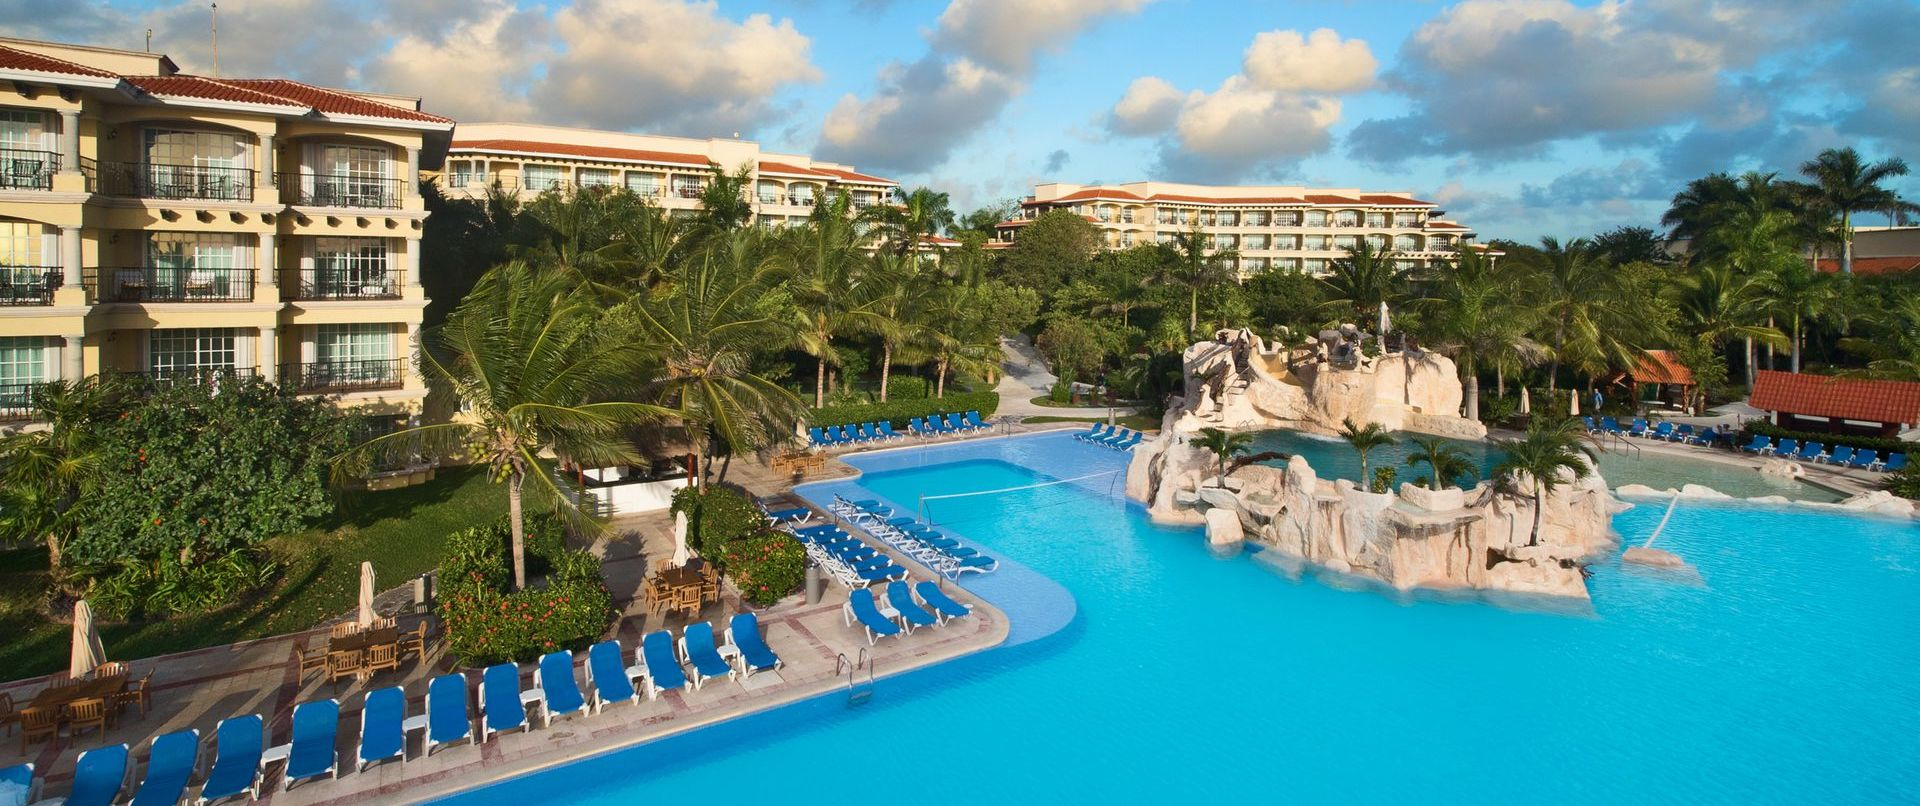 Hotel Marina El Cid Pool | Mexico Cruising Guide | Snag-A-Slip